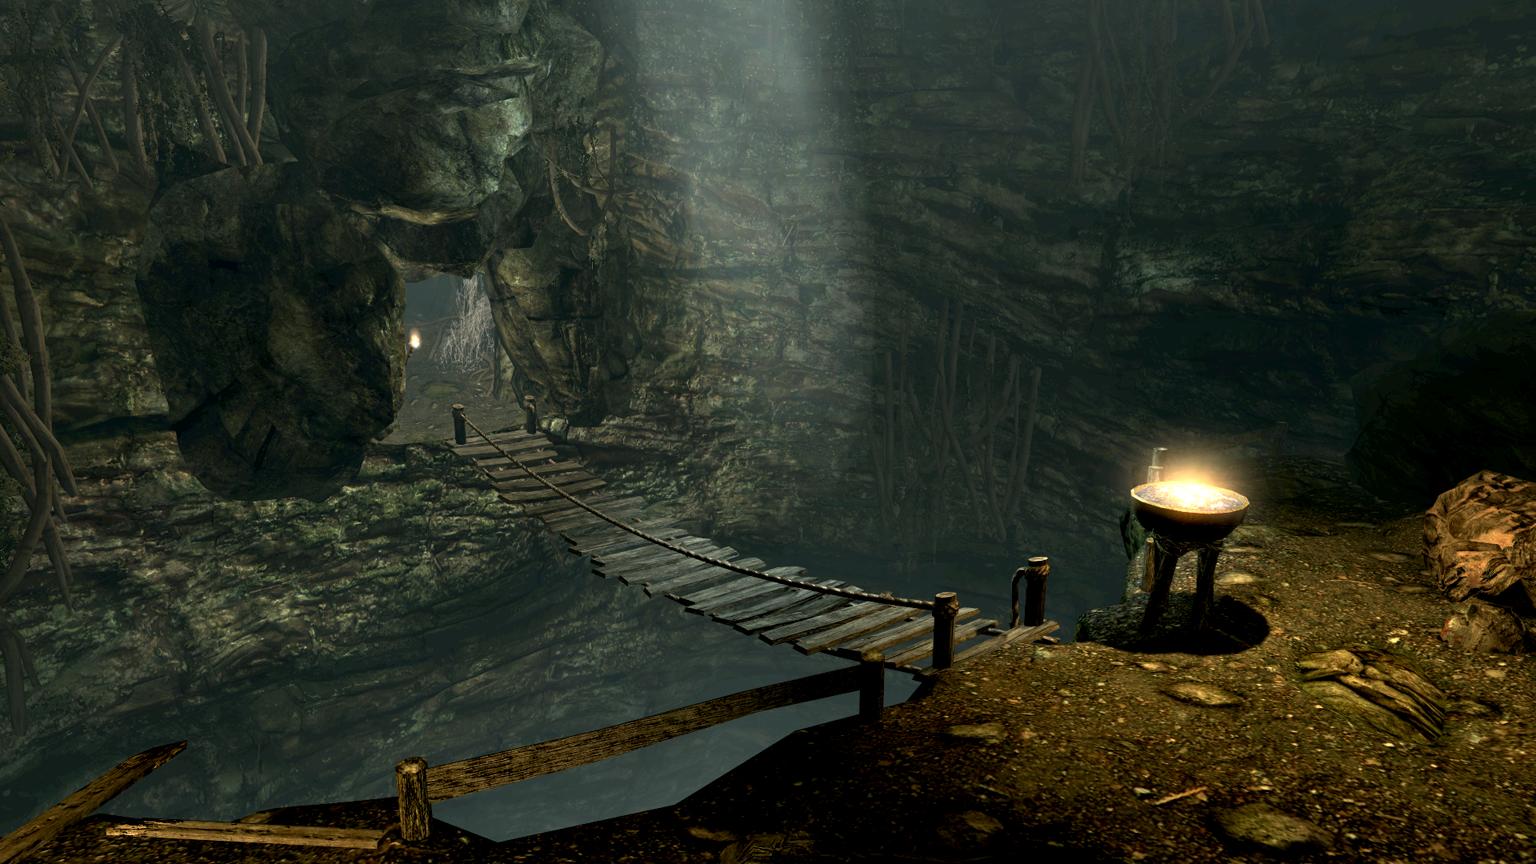 Darkfall Cave Elder Scrolls Fandom Powered By Wikia